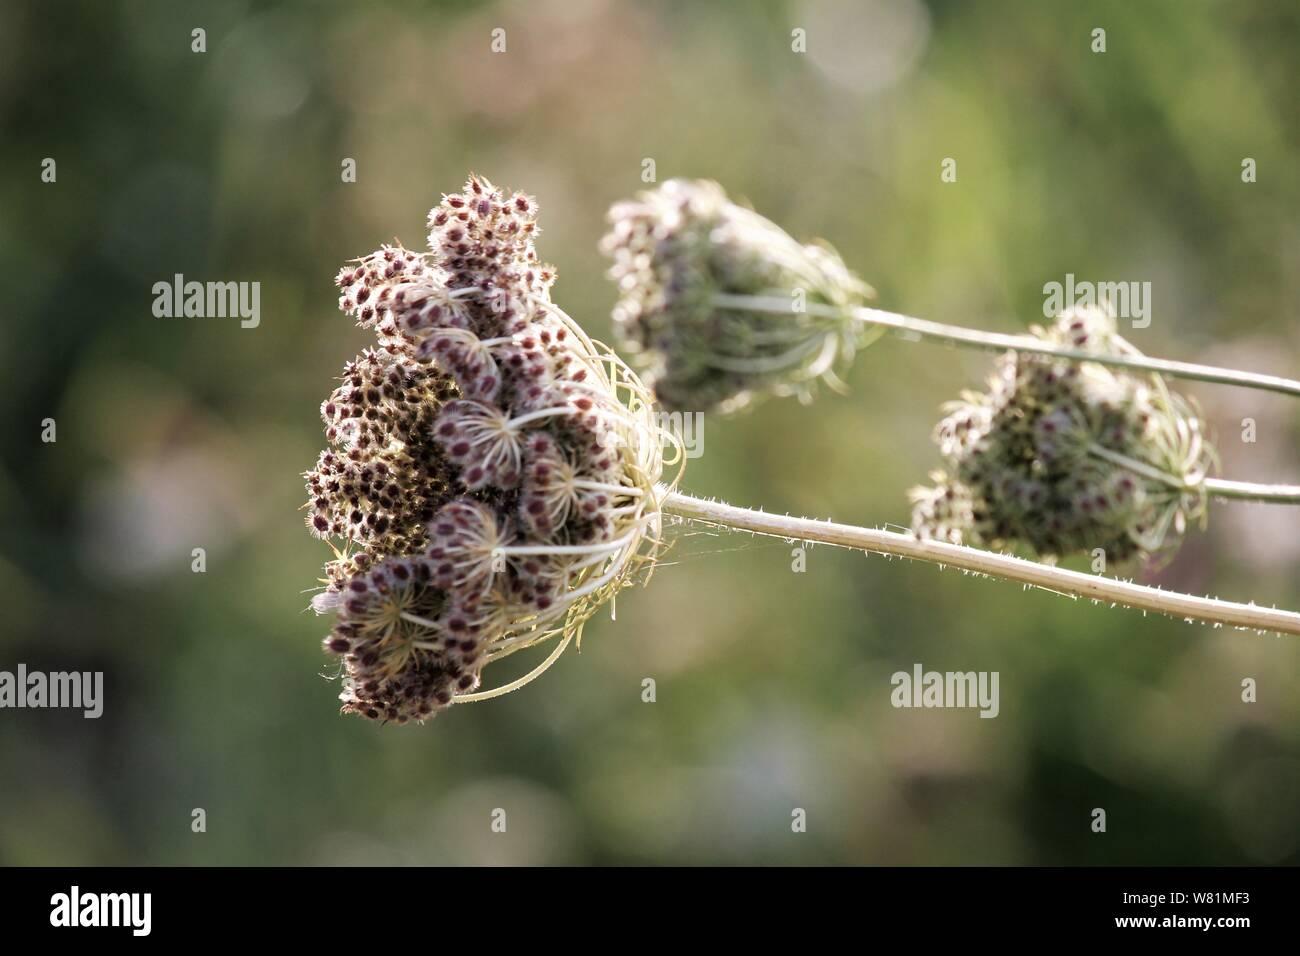 Pflanze im Spätsommer, voller Samen Stock Photo